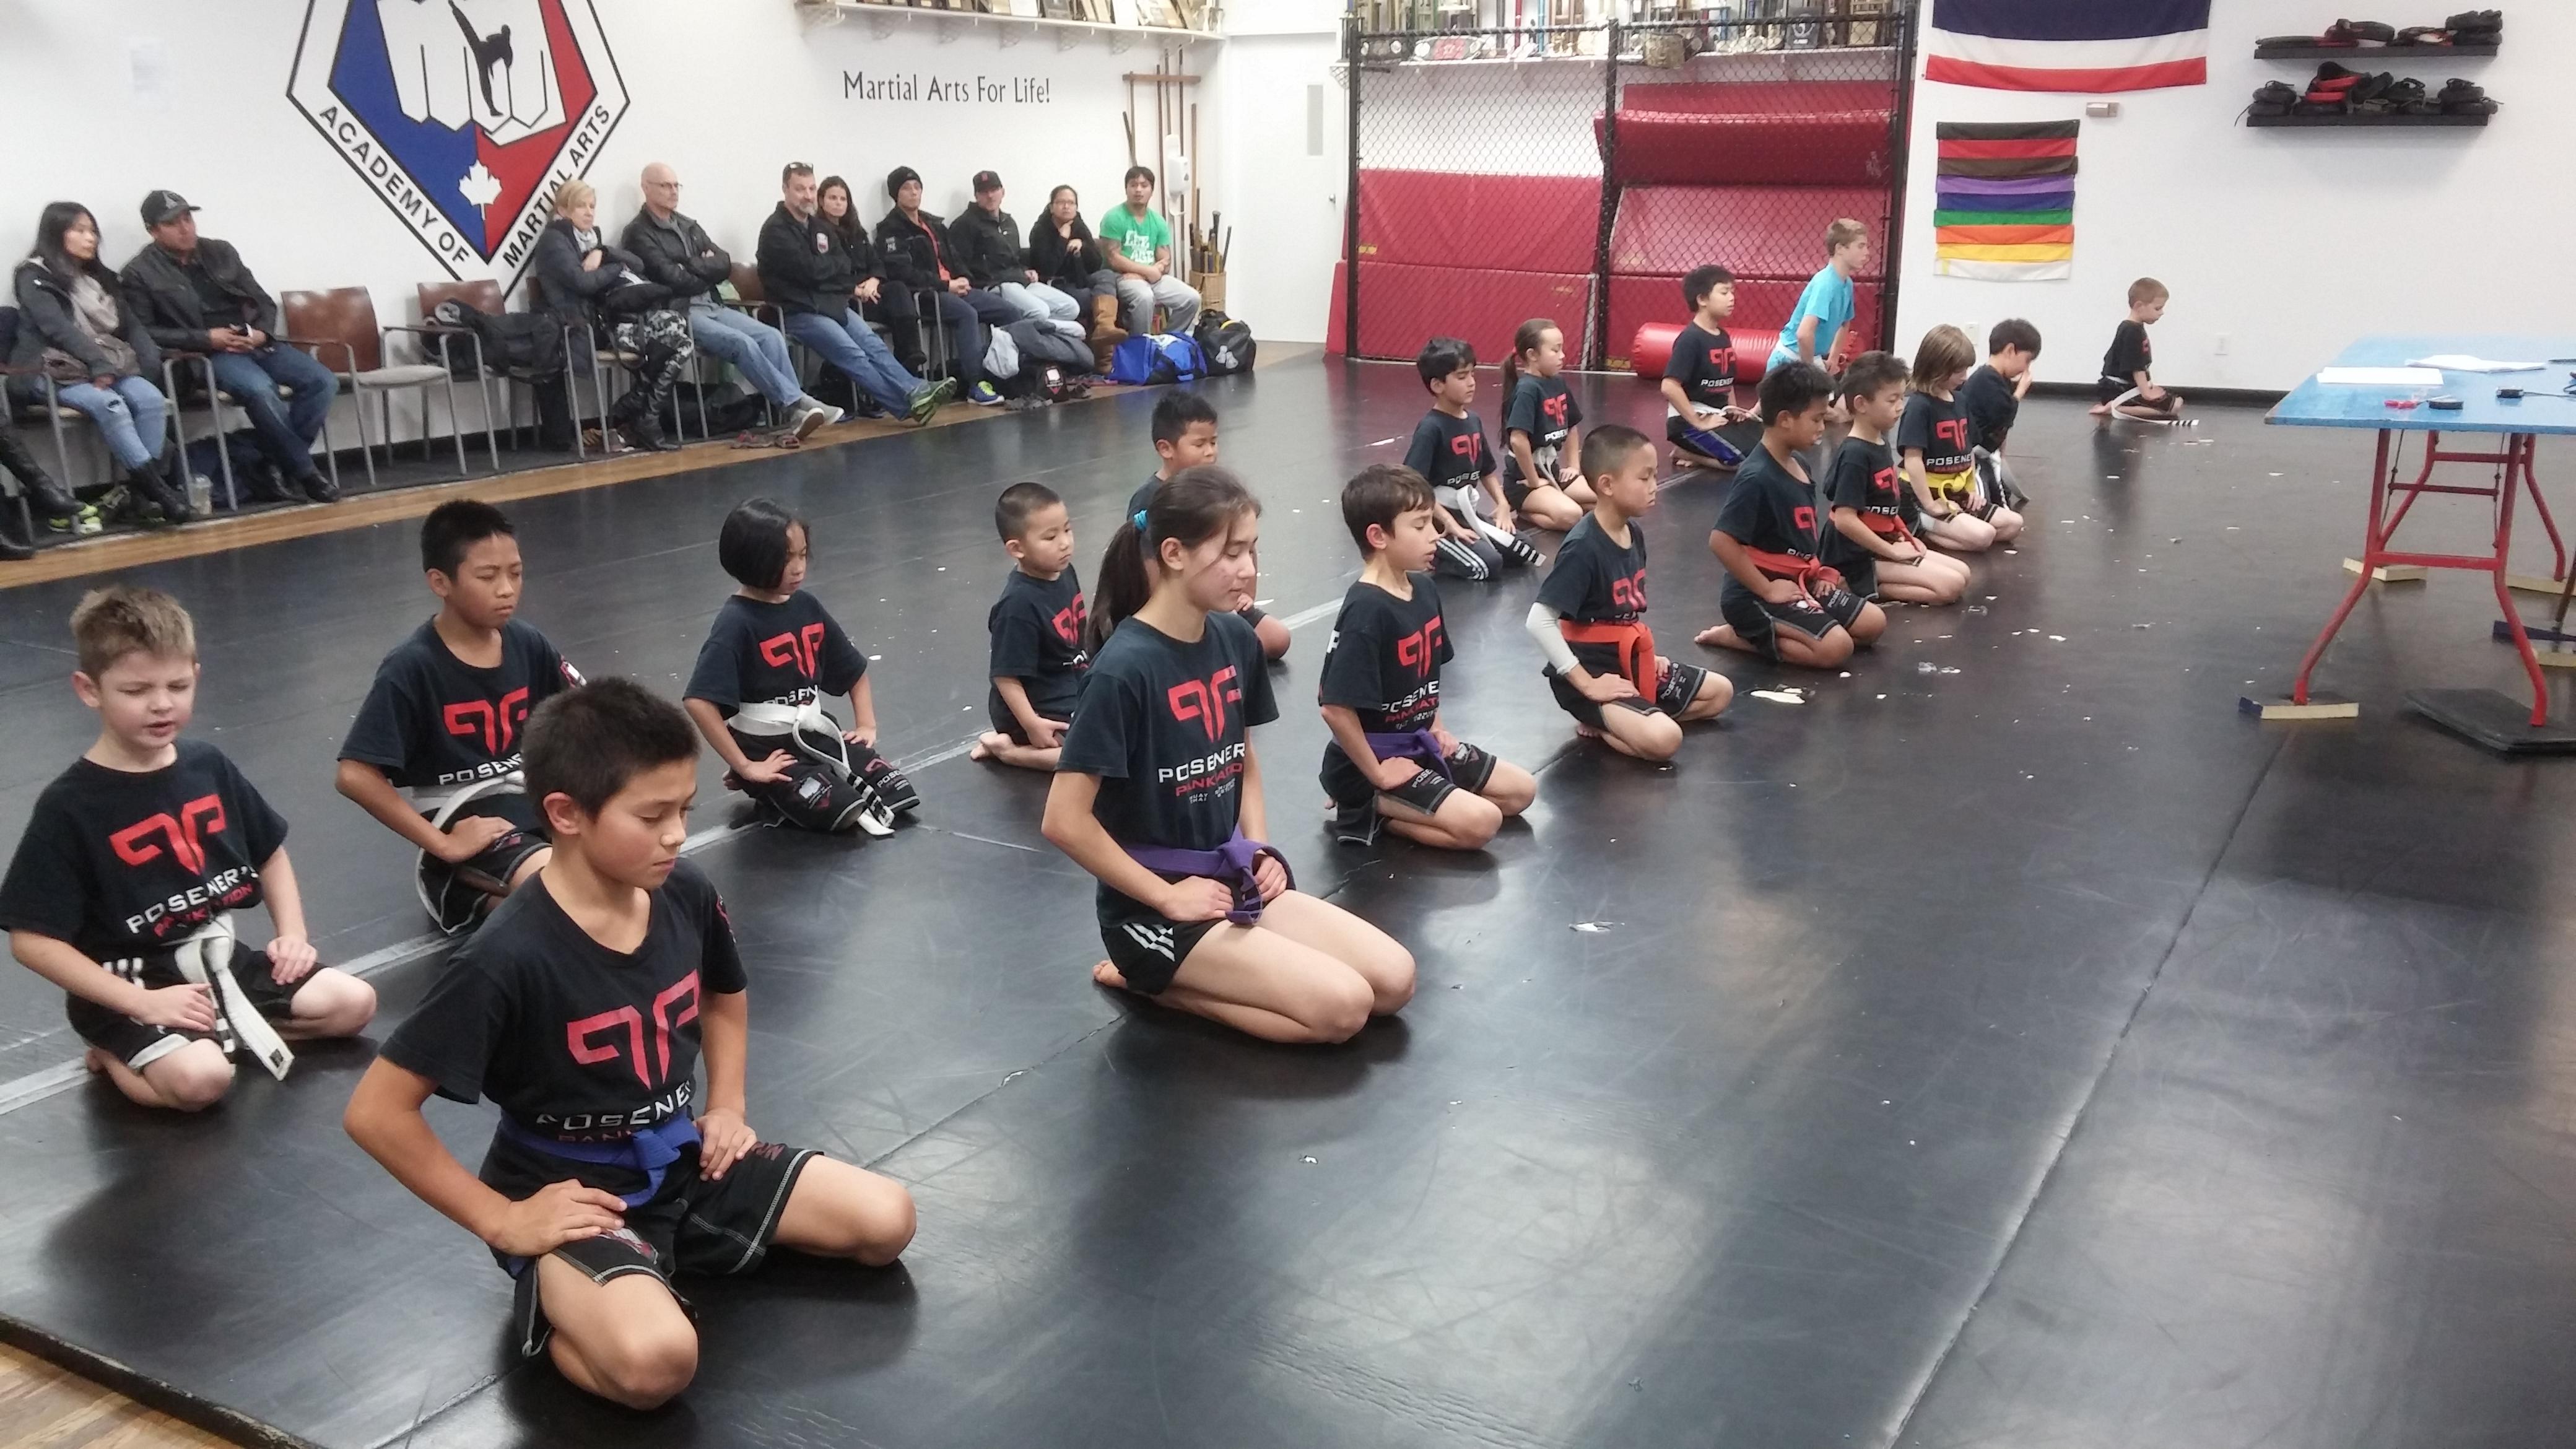 Children's Martial Arts Vancouver